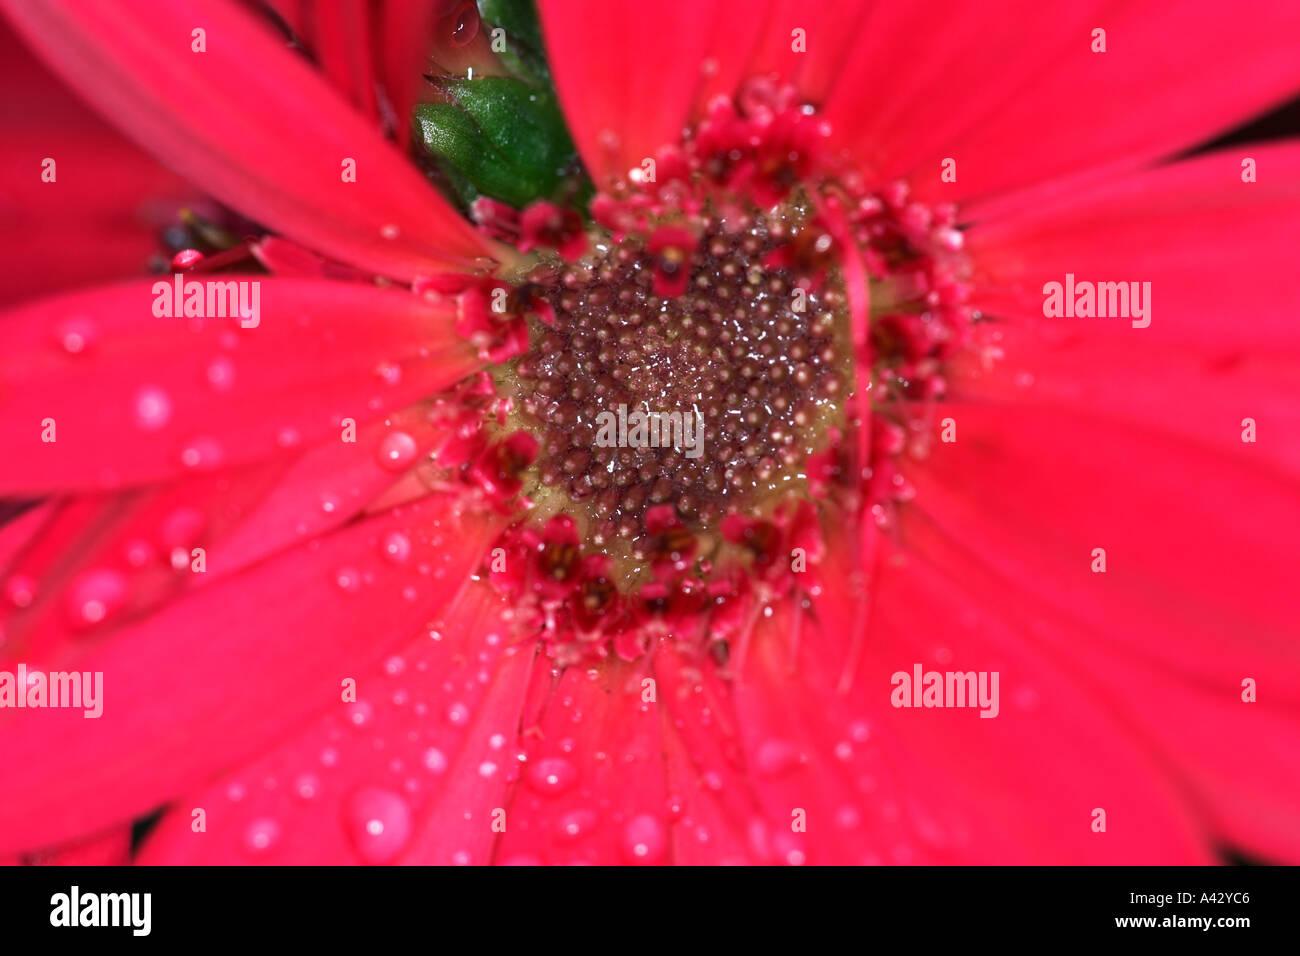 Red Gerbera Daisy Flower with Raindrops Stock Photo: 3564485 - Alamy